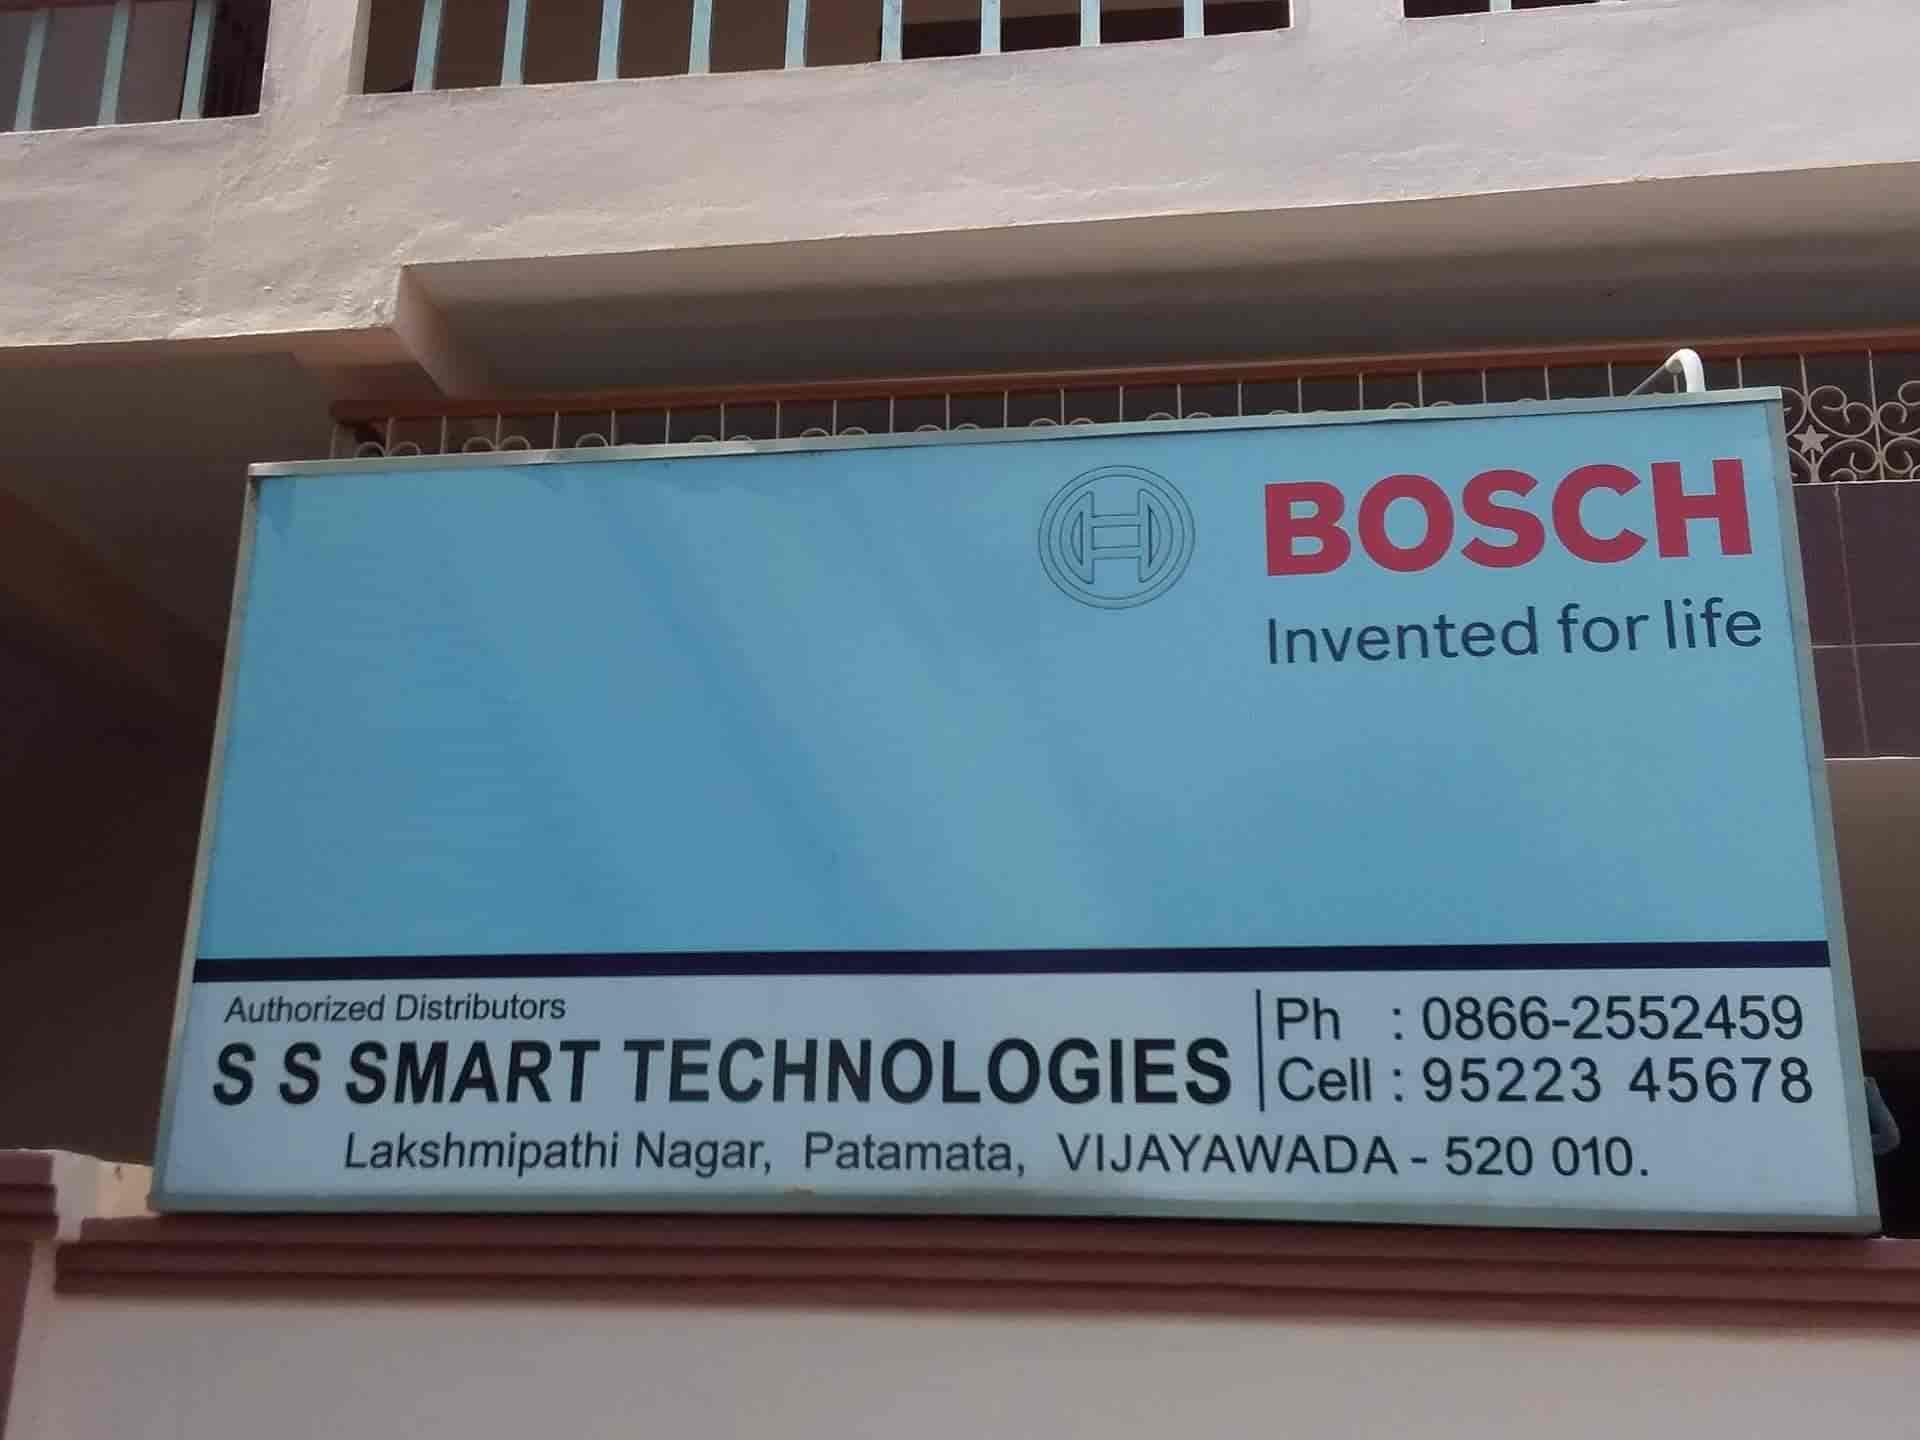 Andhra Wholesale Electronics, Patamata - Mobile Phone